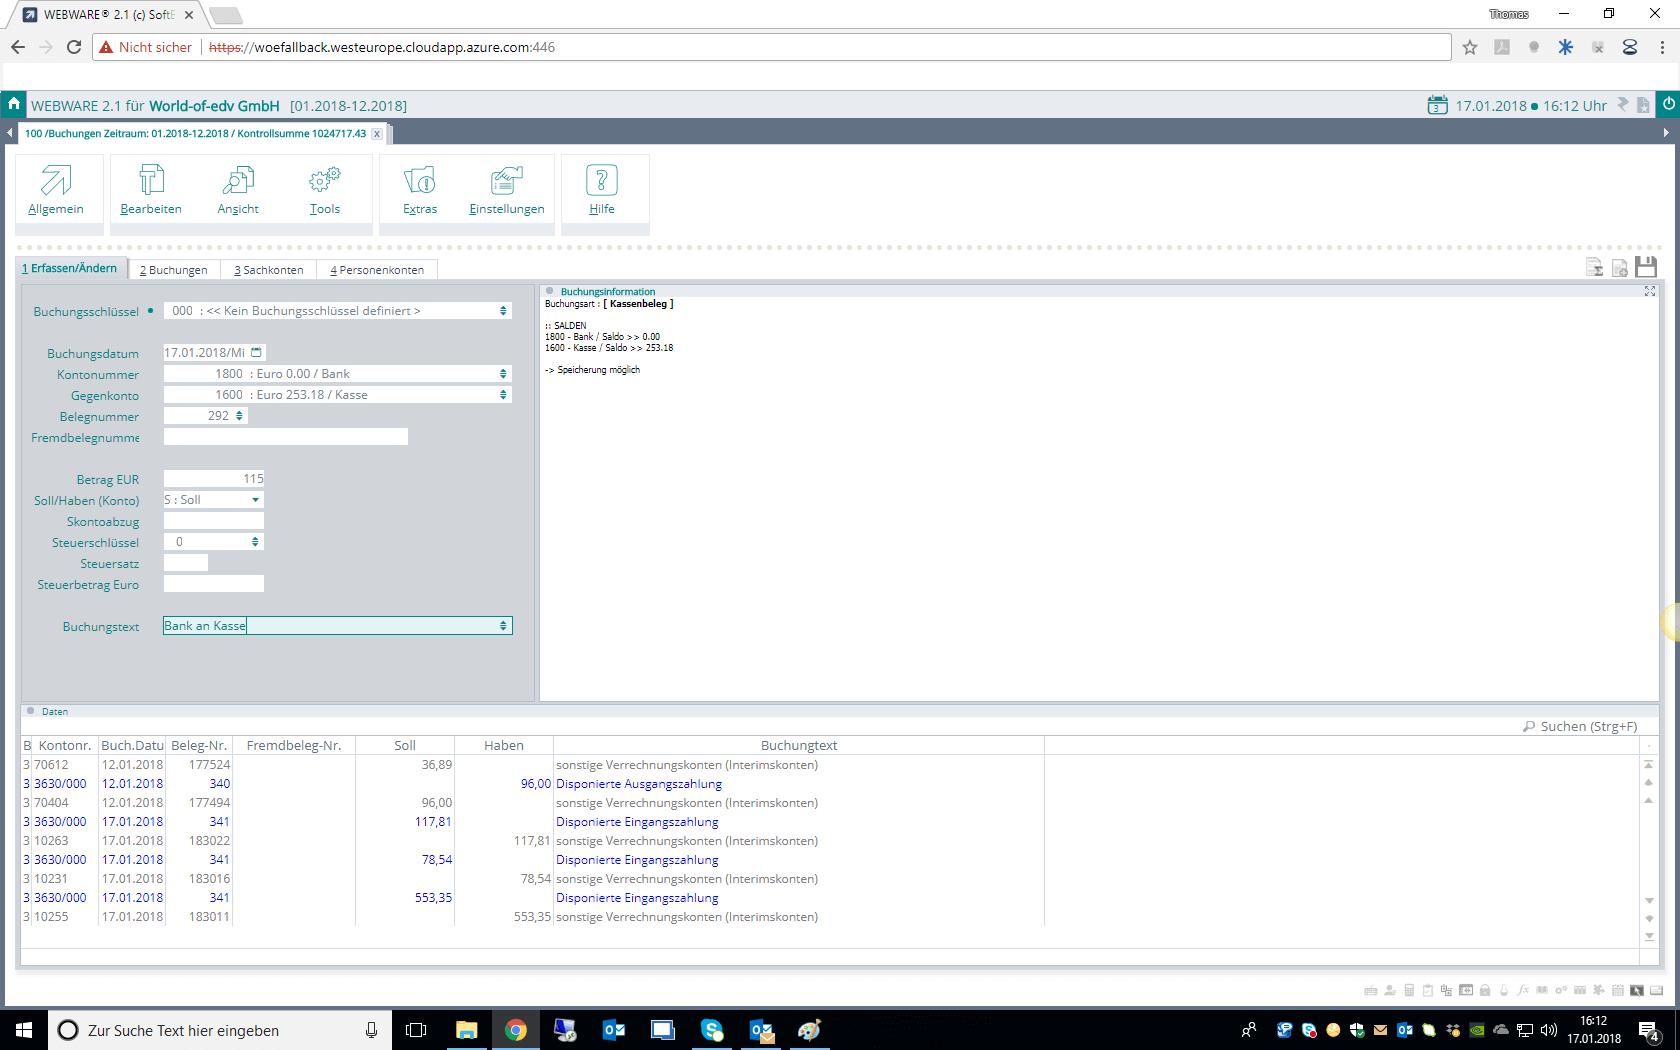 Screenshot Finanzbuchhaltung (Fibu) in der WEBWARE